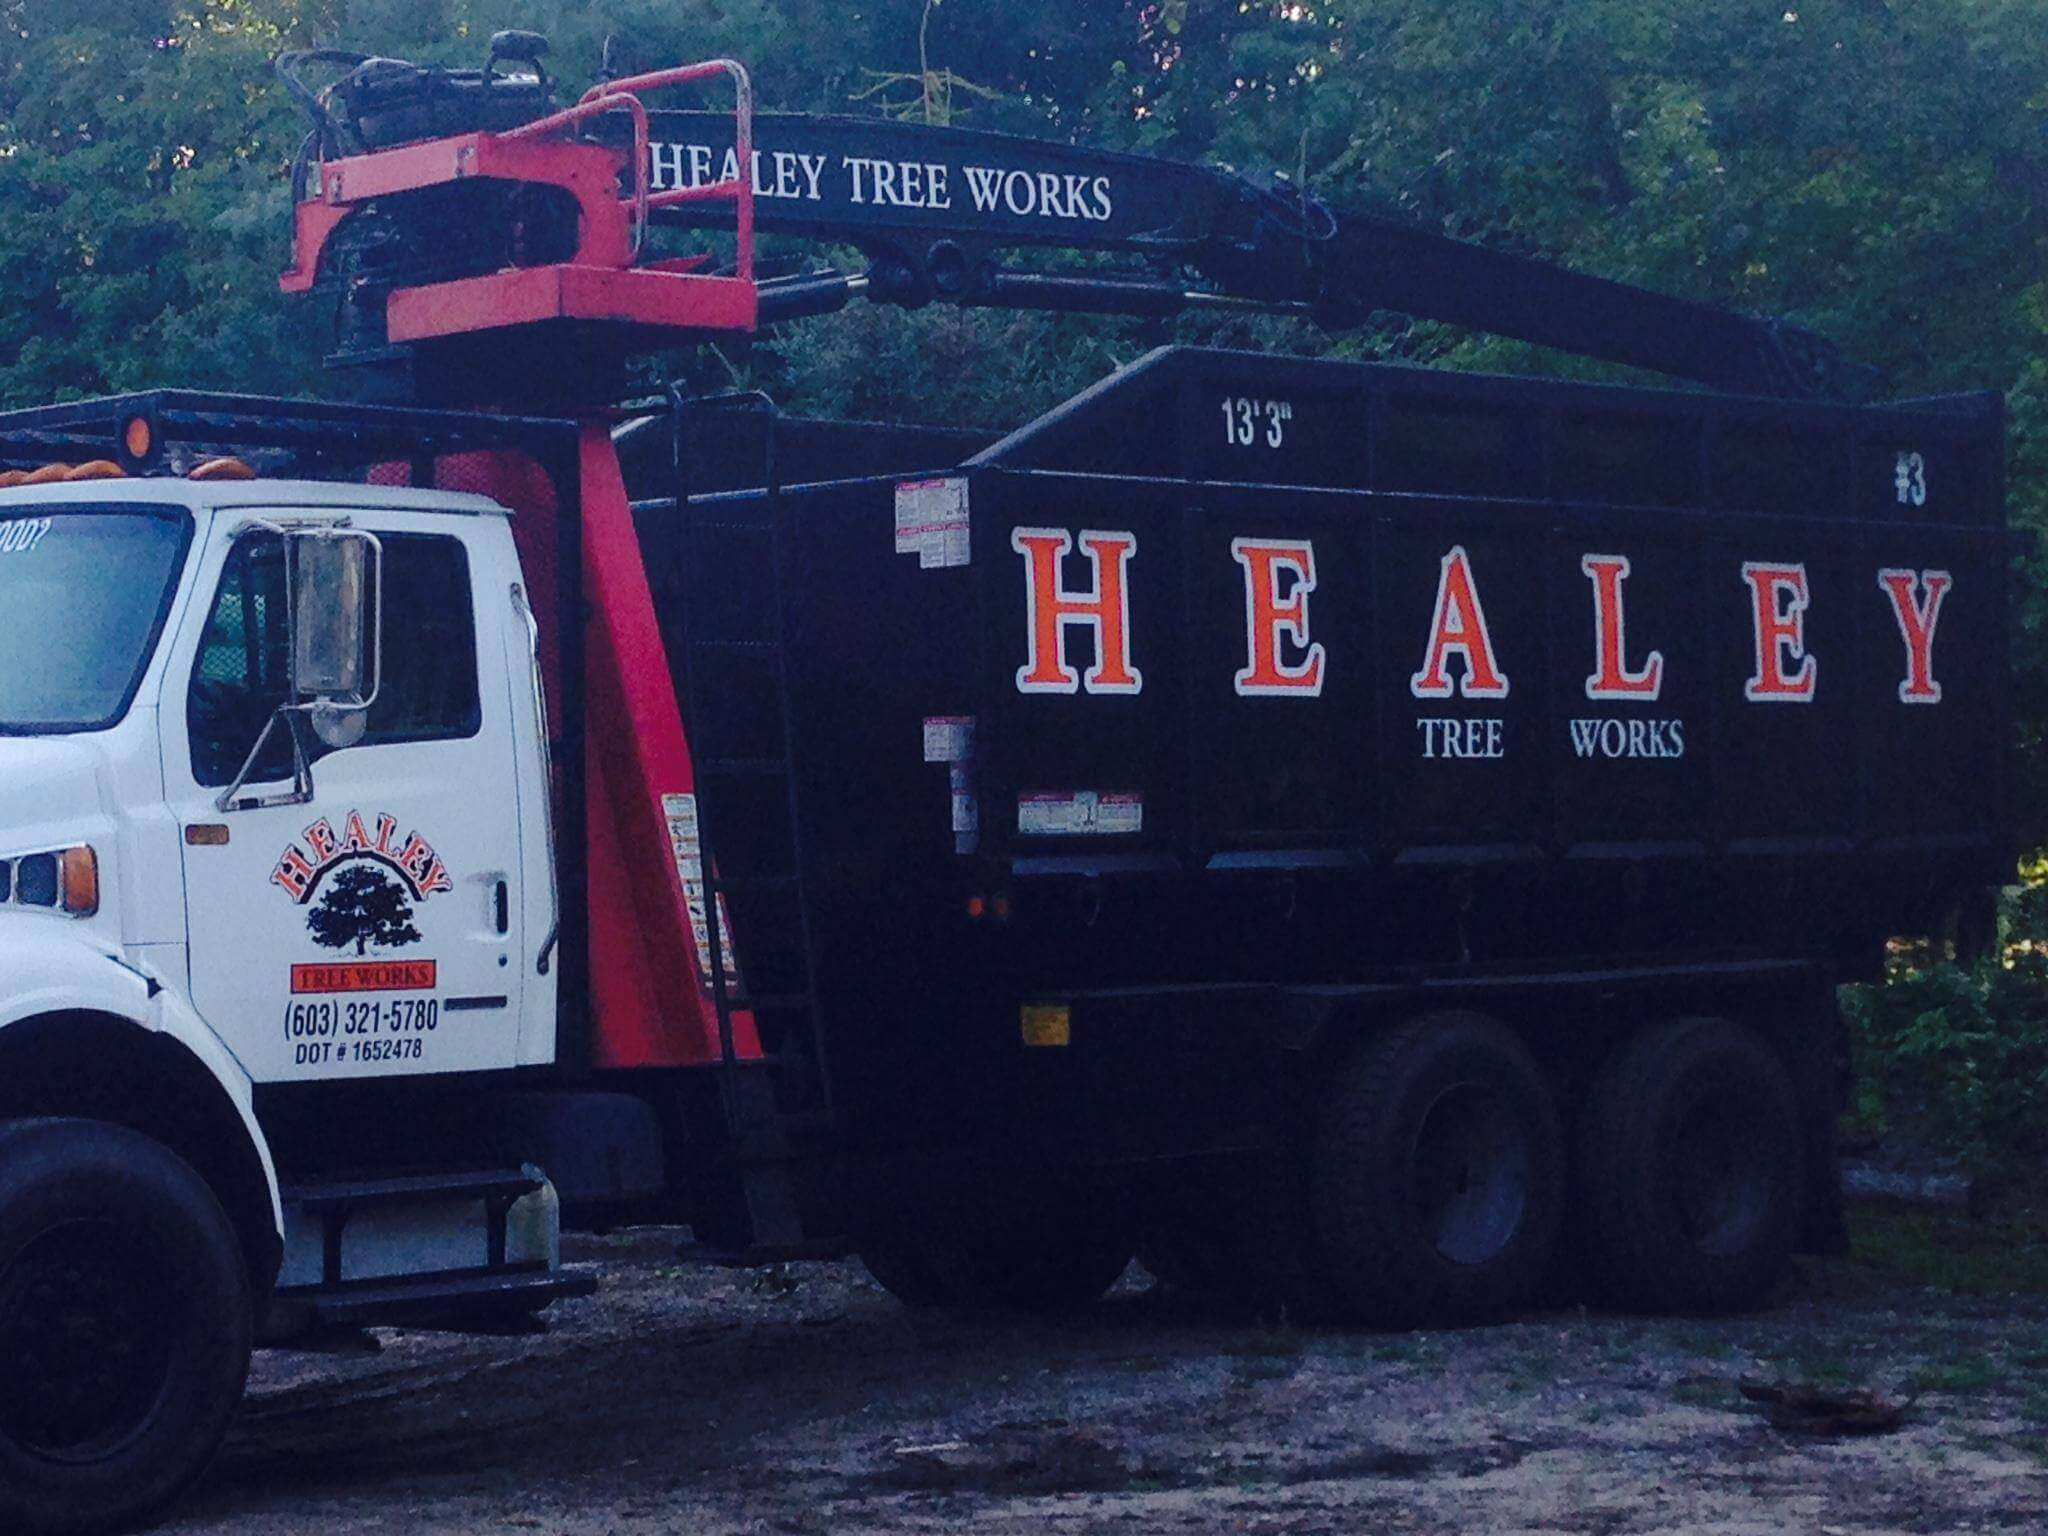 healey tree works truck